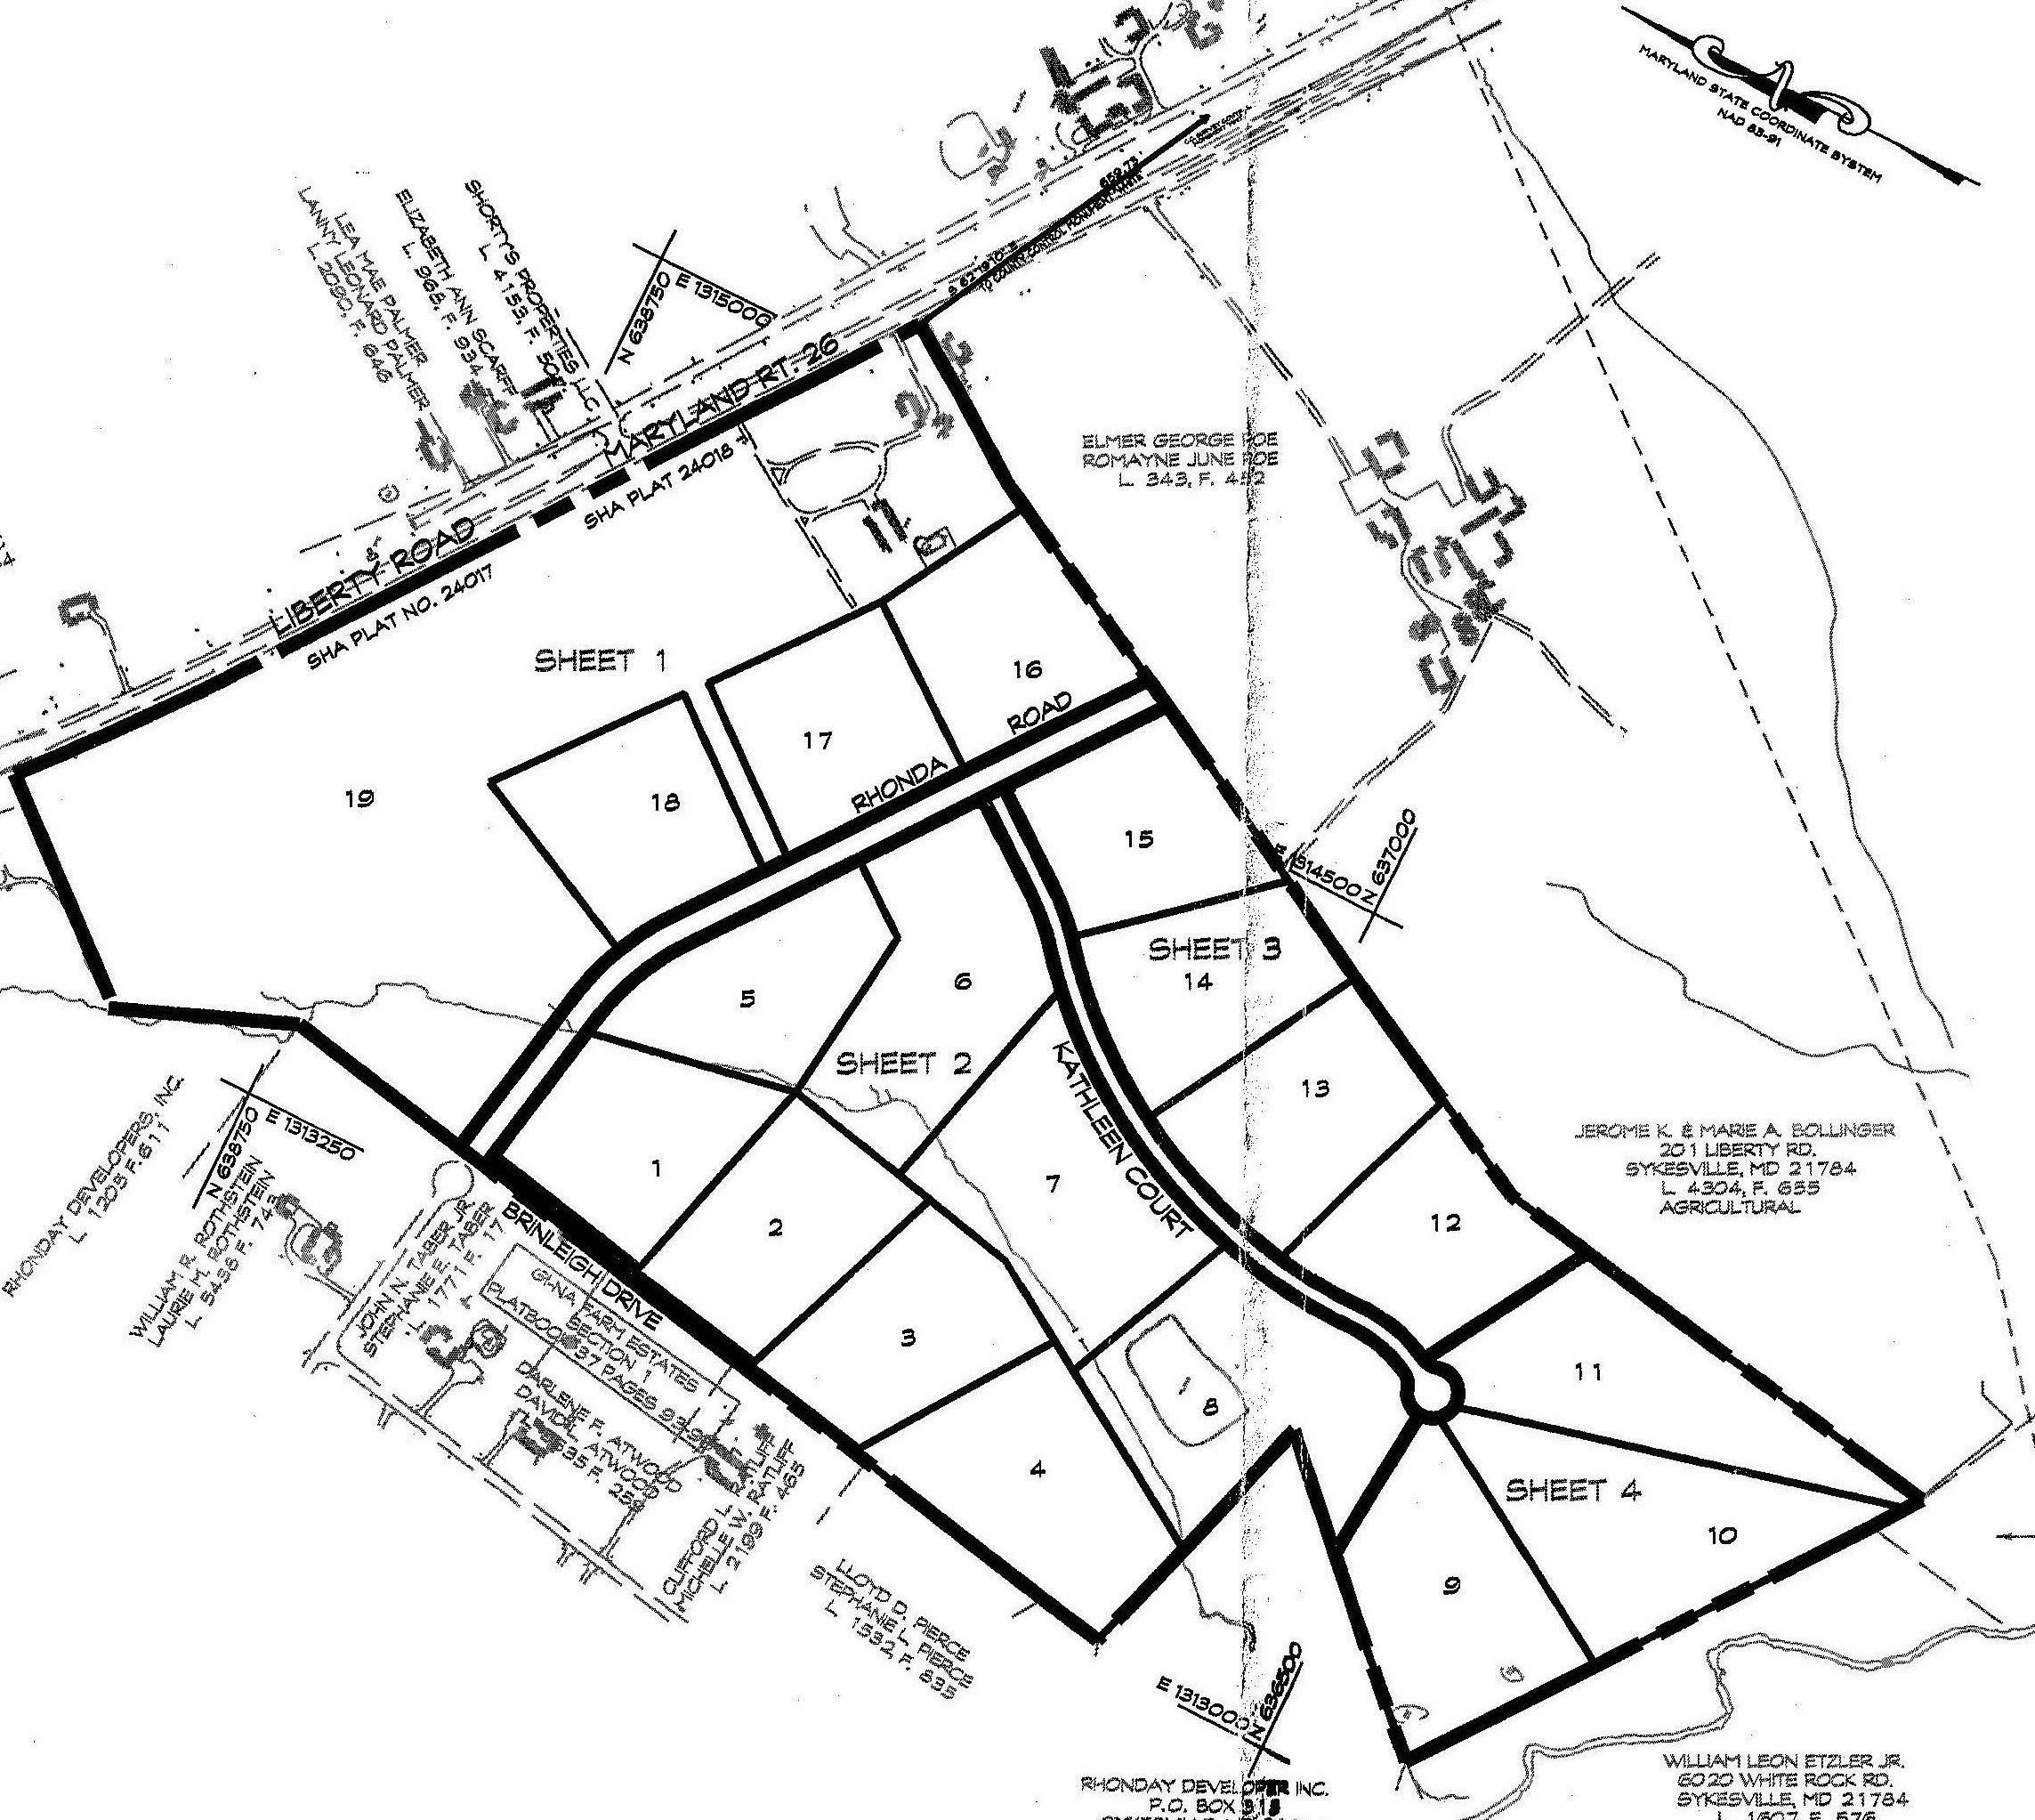 Site plan for Long Reach Farms